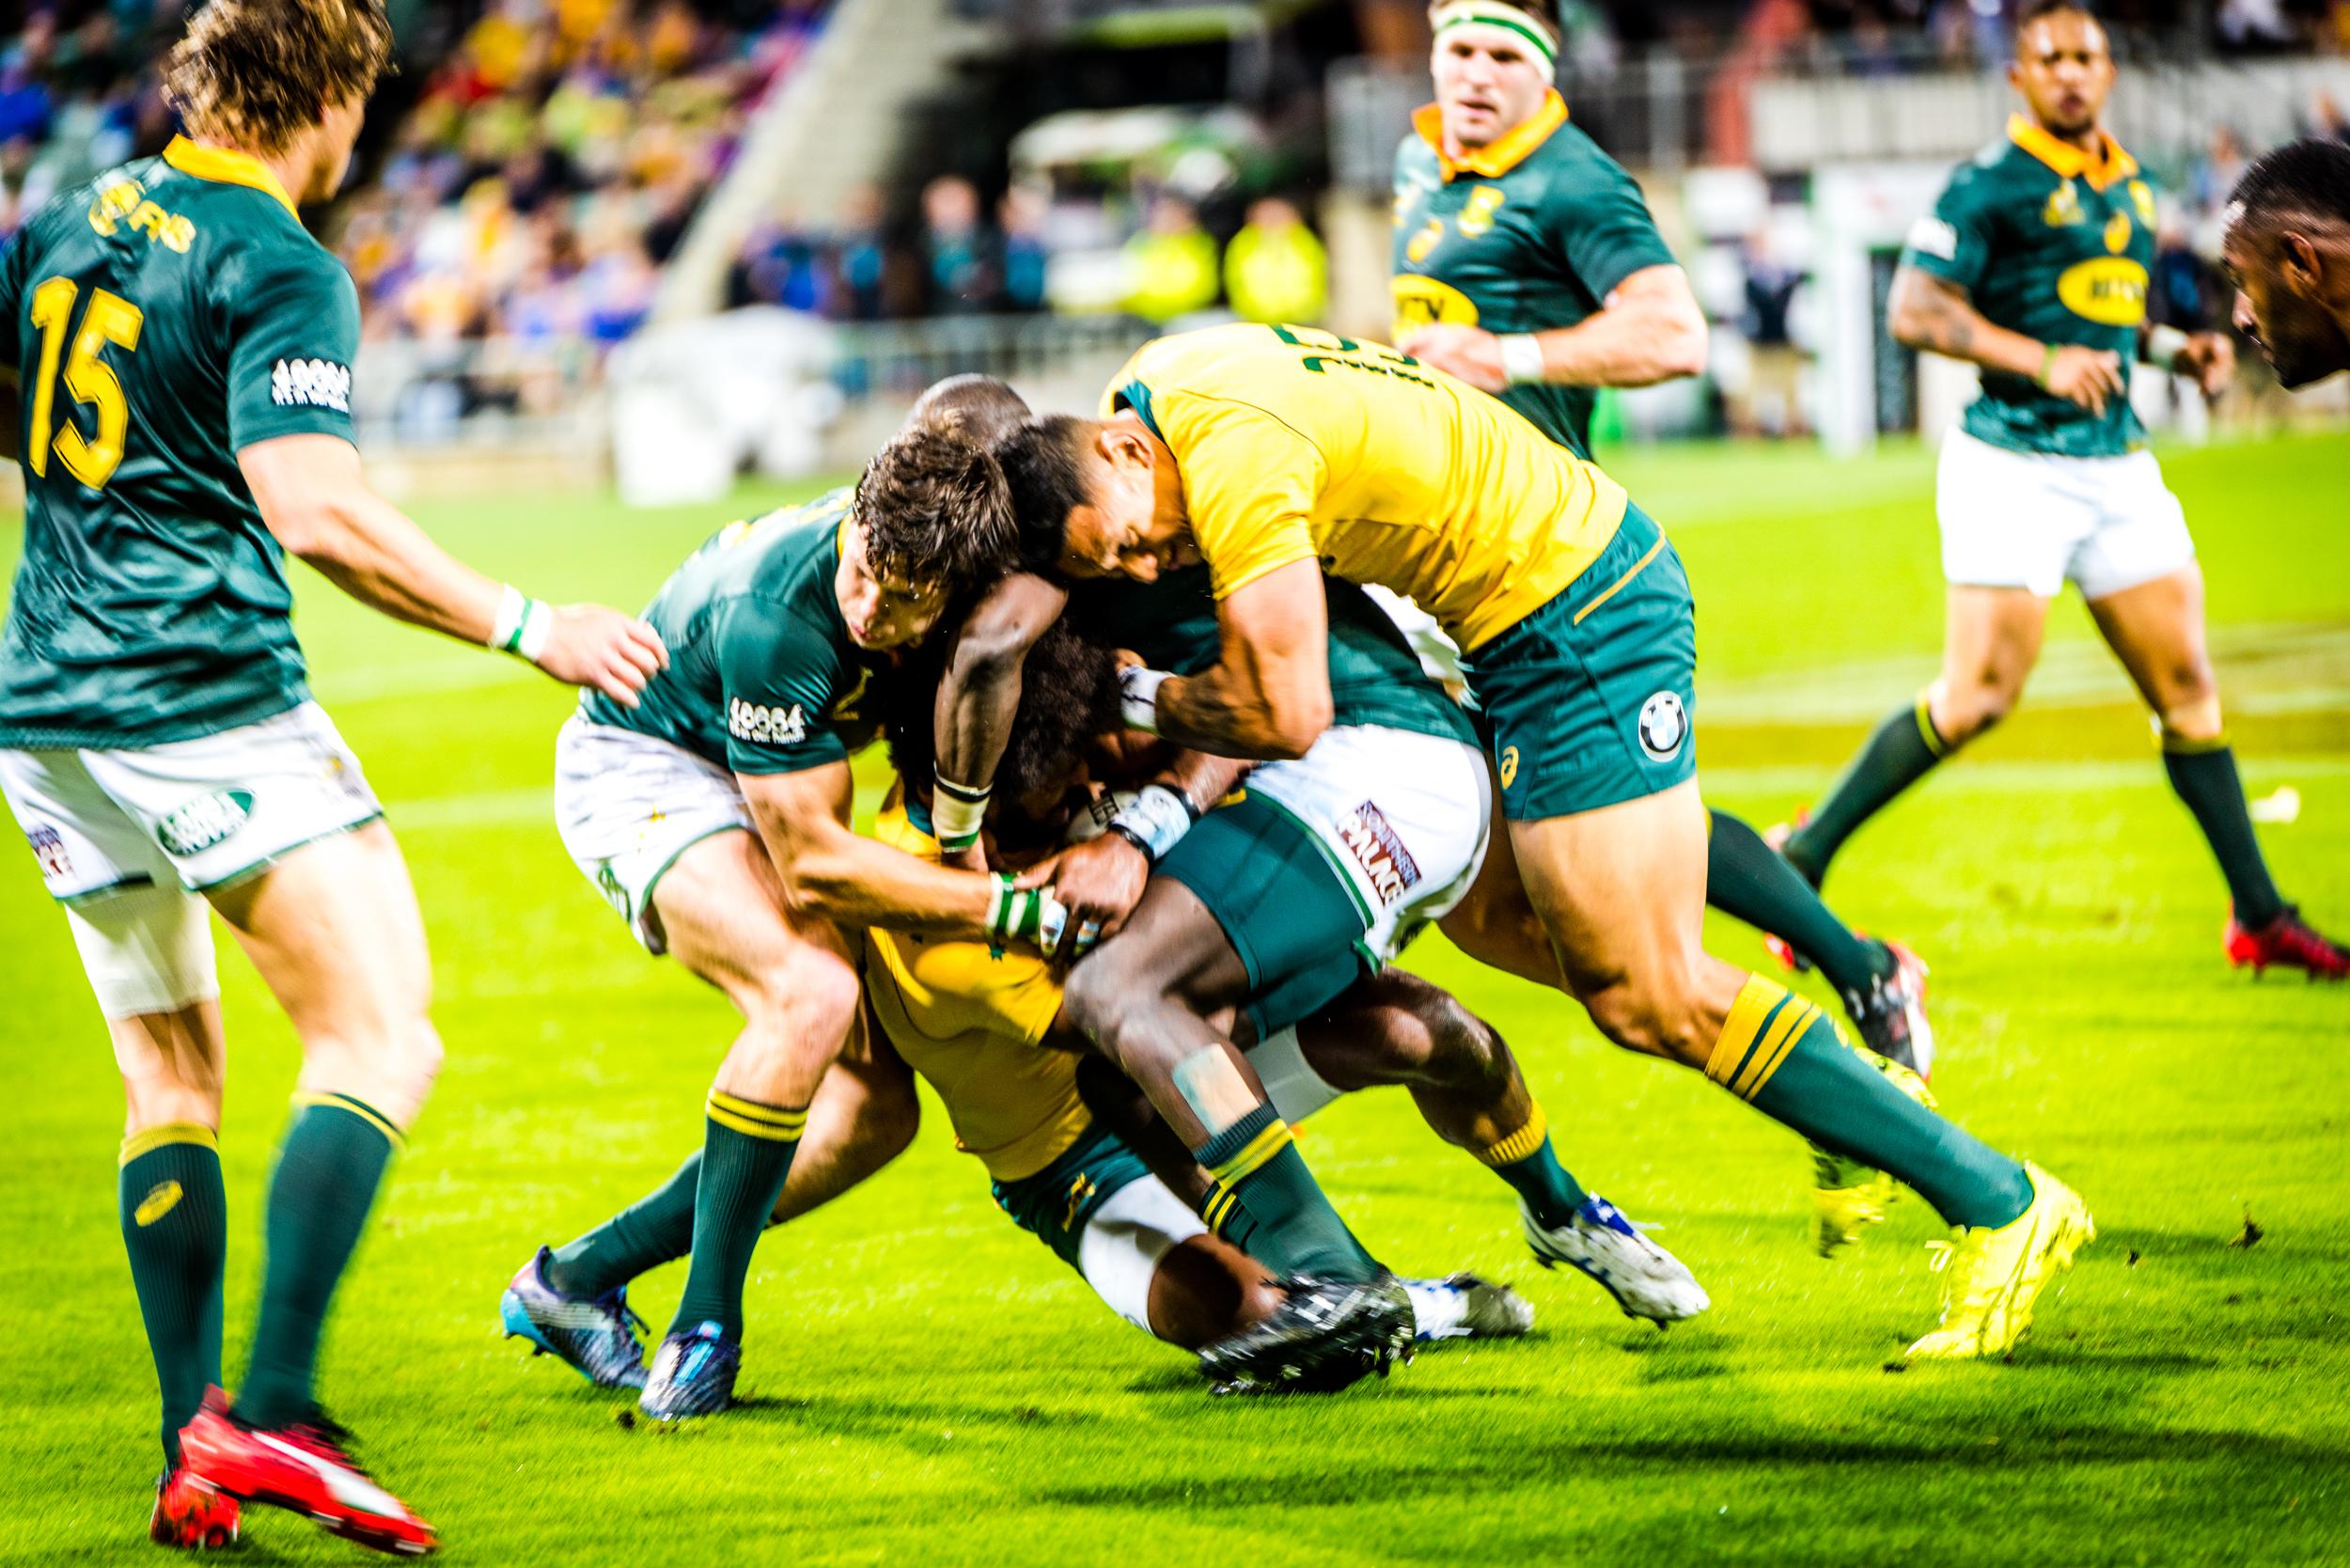 Spyrides_Kyle_RugbyChampionship_Perth_9.9.2017_DSC7260.jpg